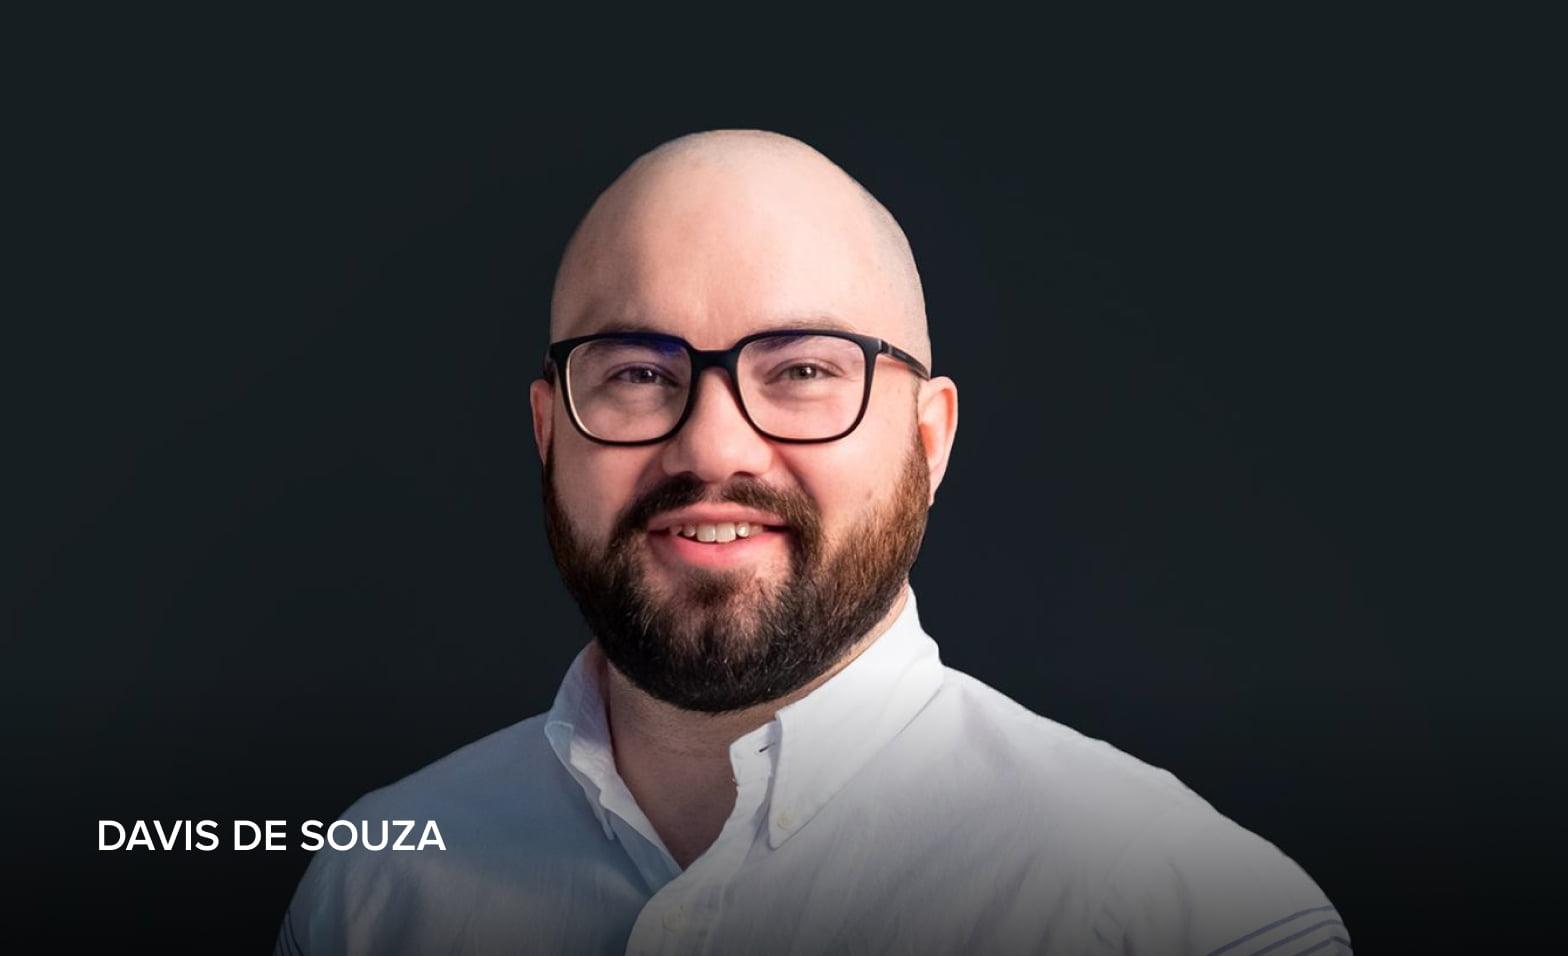 A headshot of Davis de Souza, AvePoint Lead, Western Canada